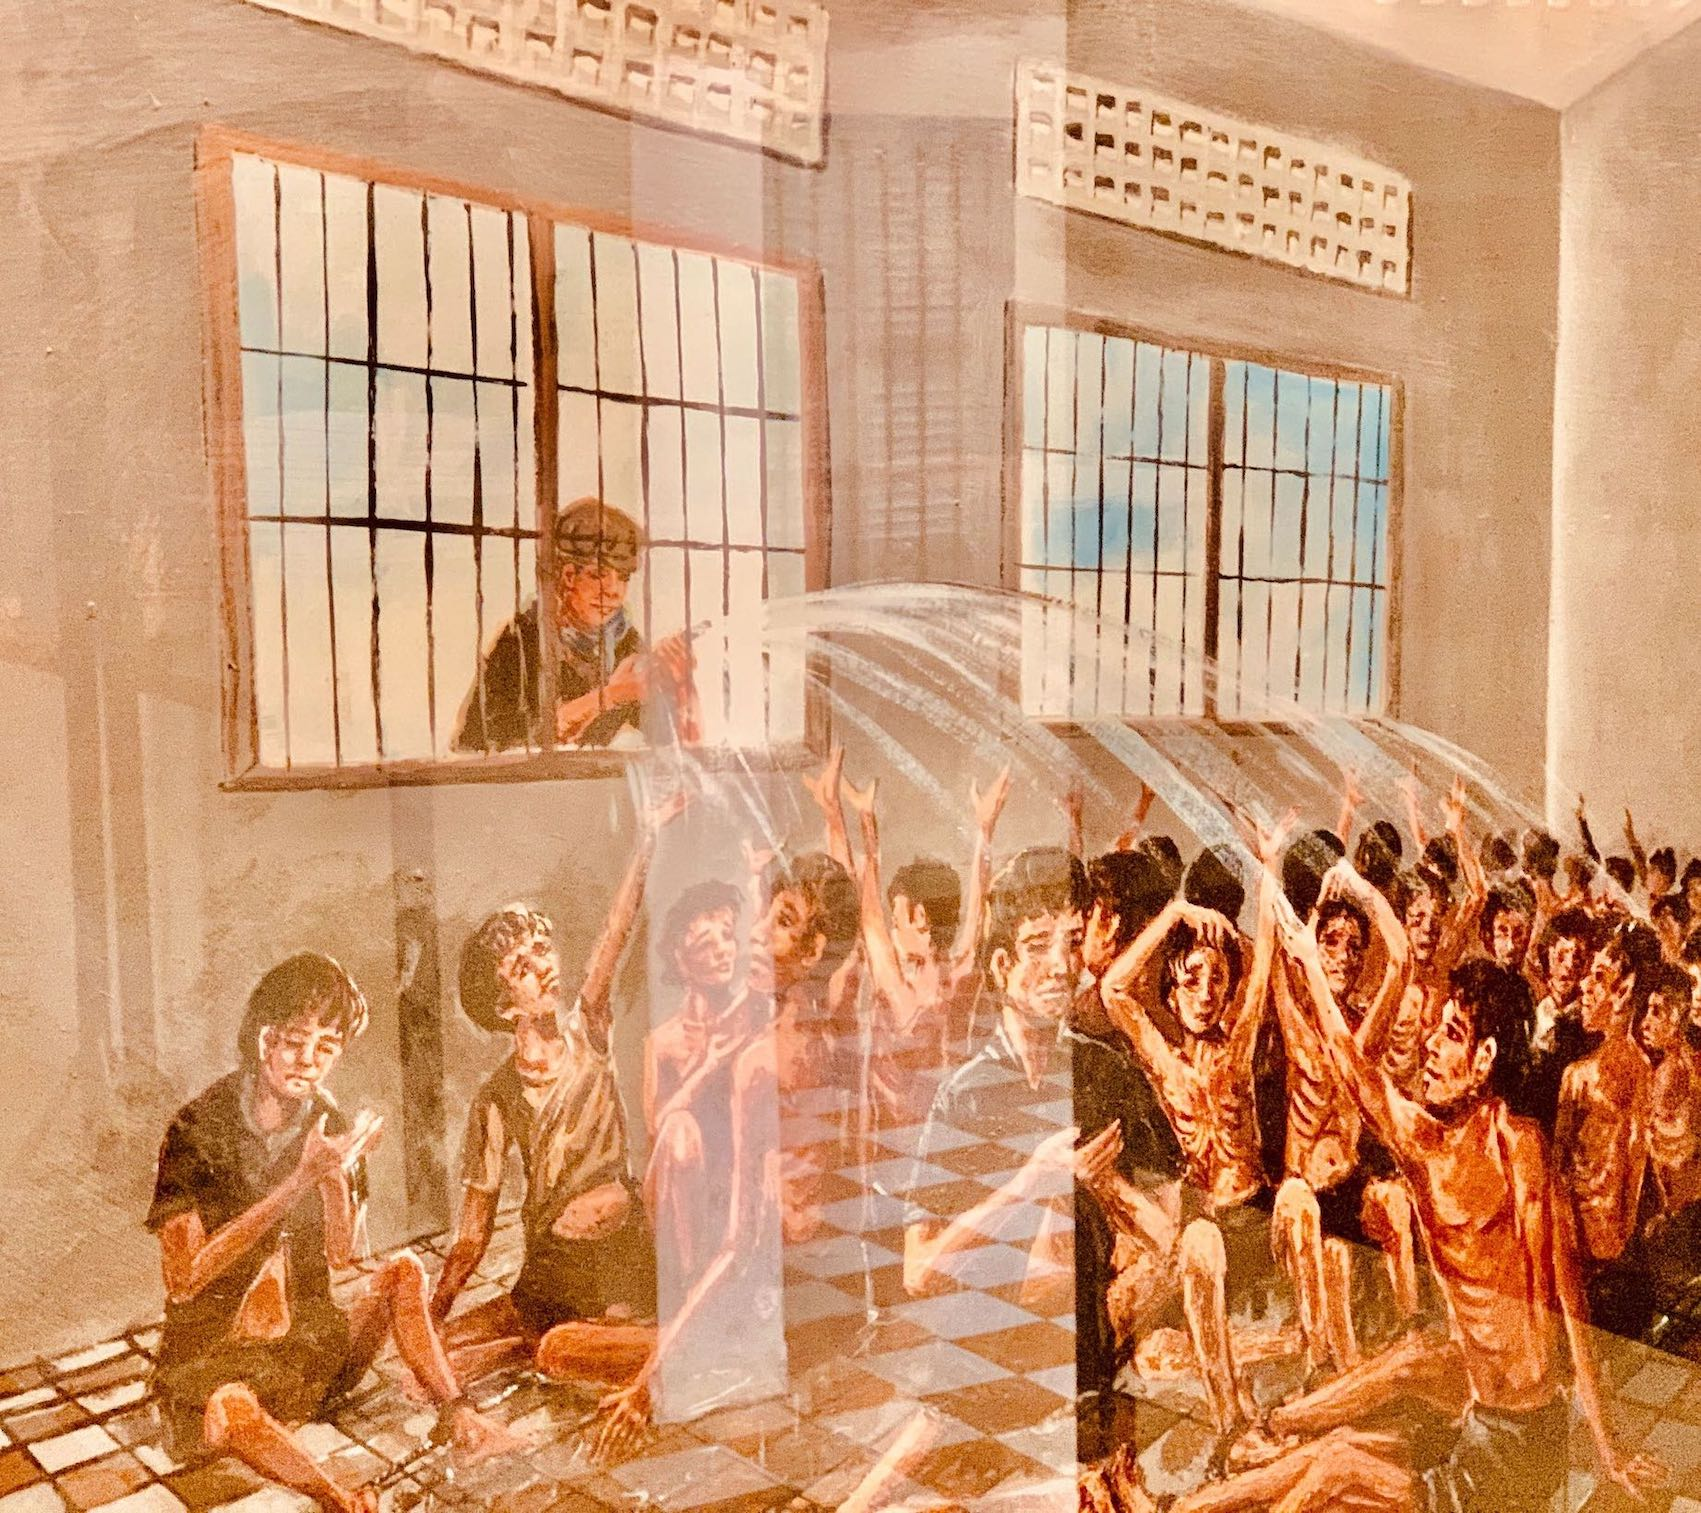 Cambodian genocide artwork in Phnom Penh